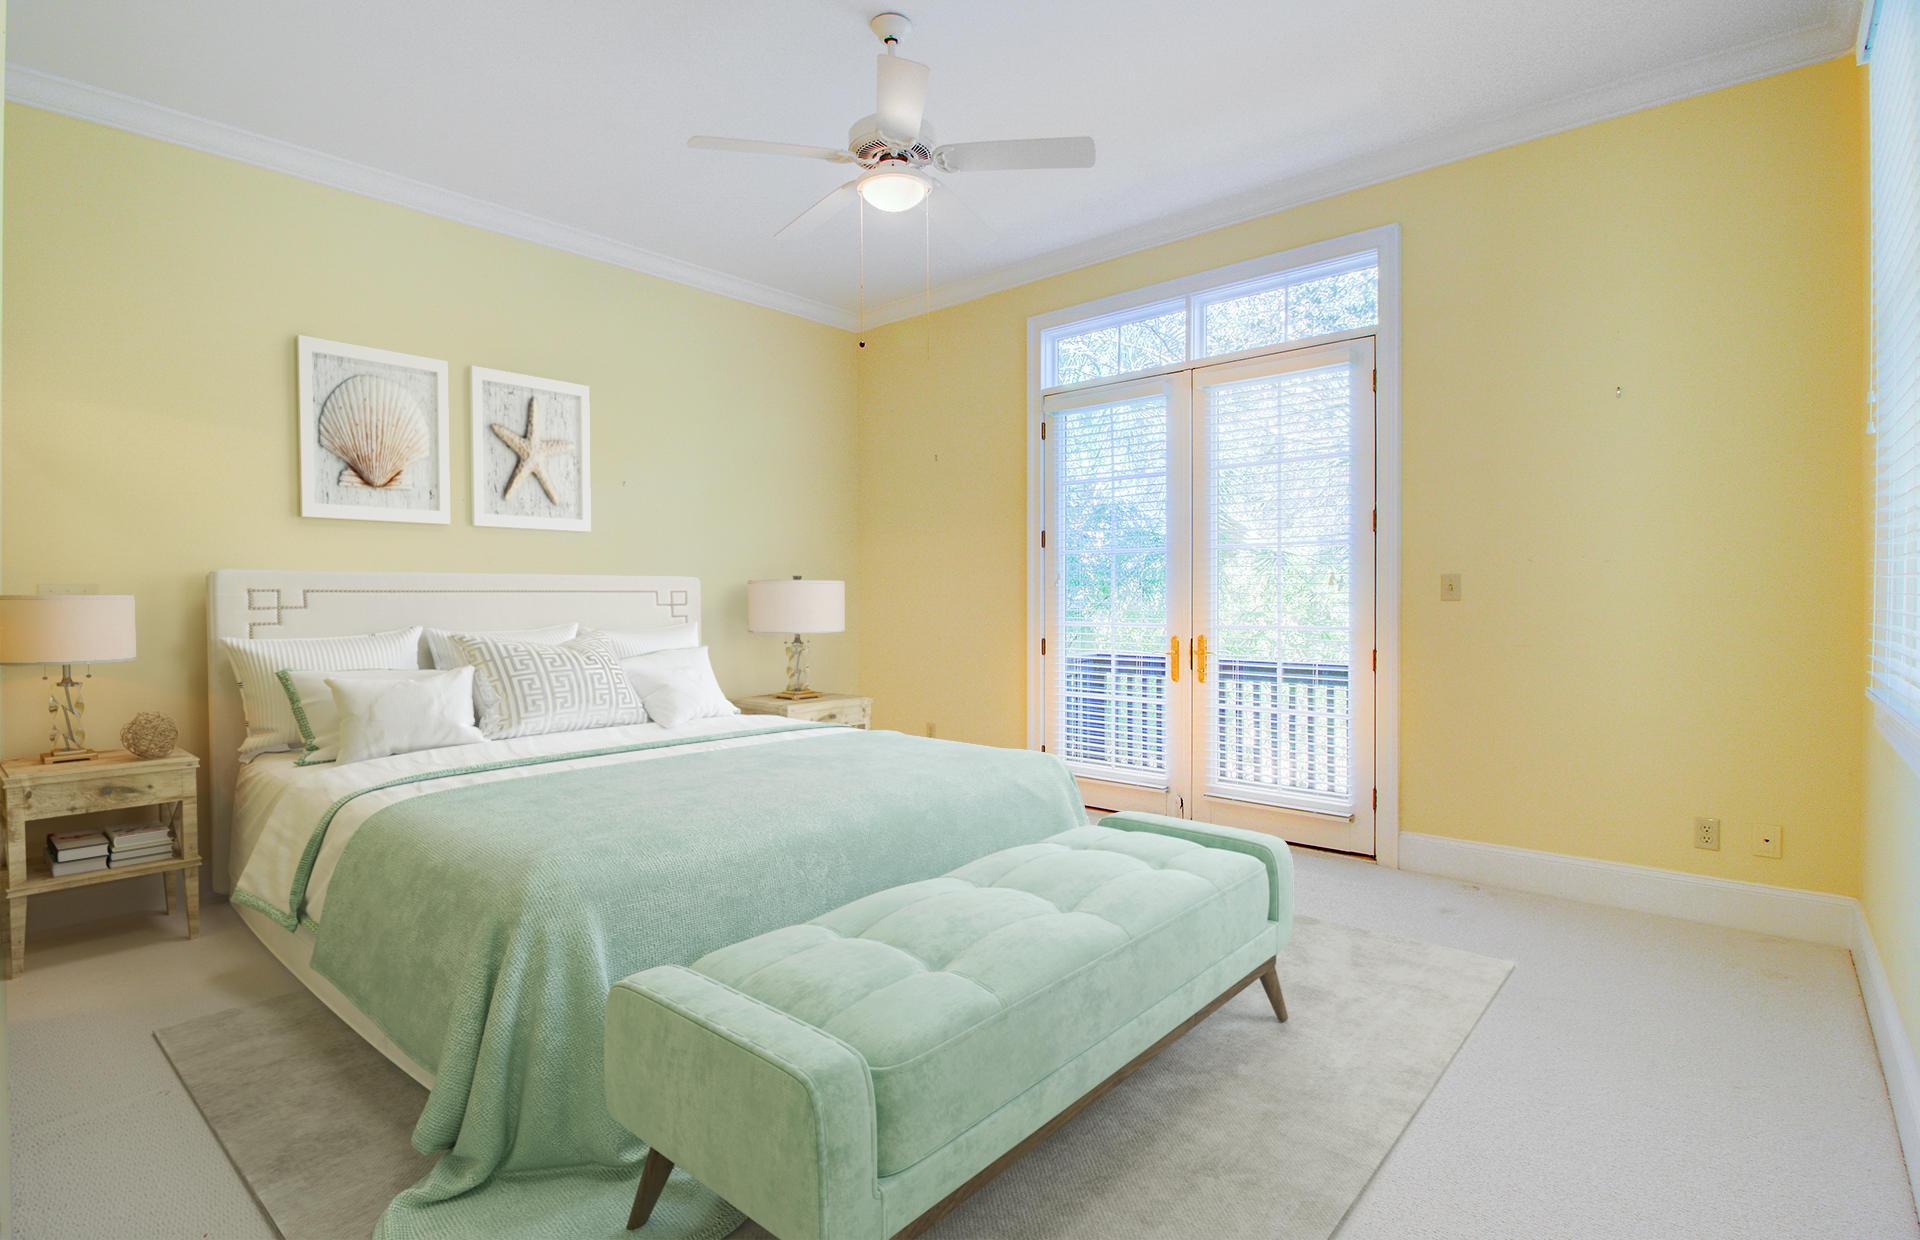 Kiawah Island Homes For Sale - 402 Ocean Oaks, Kiawah Island, SC - 37